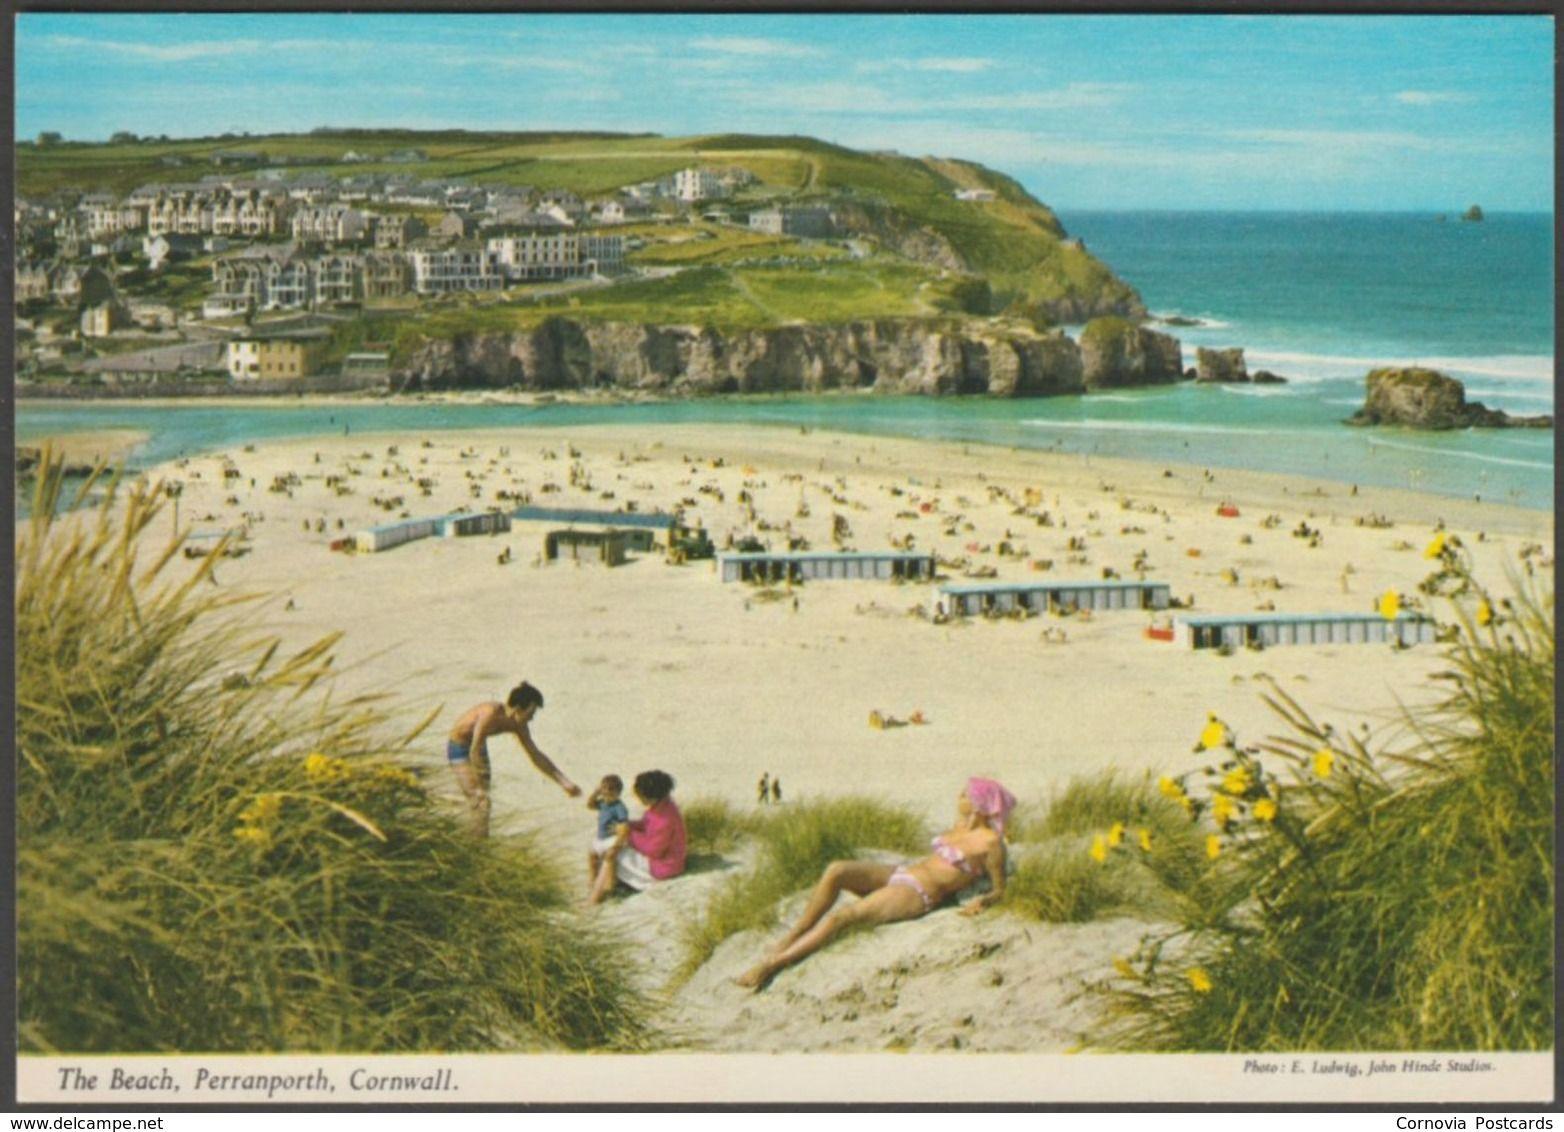 The Beach, Perranporth, Cornwall, c.1970s - John Hinde Postcard